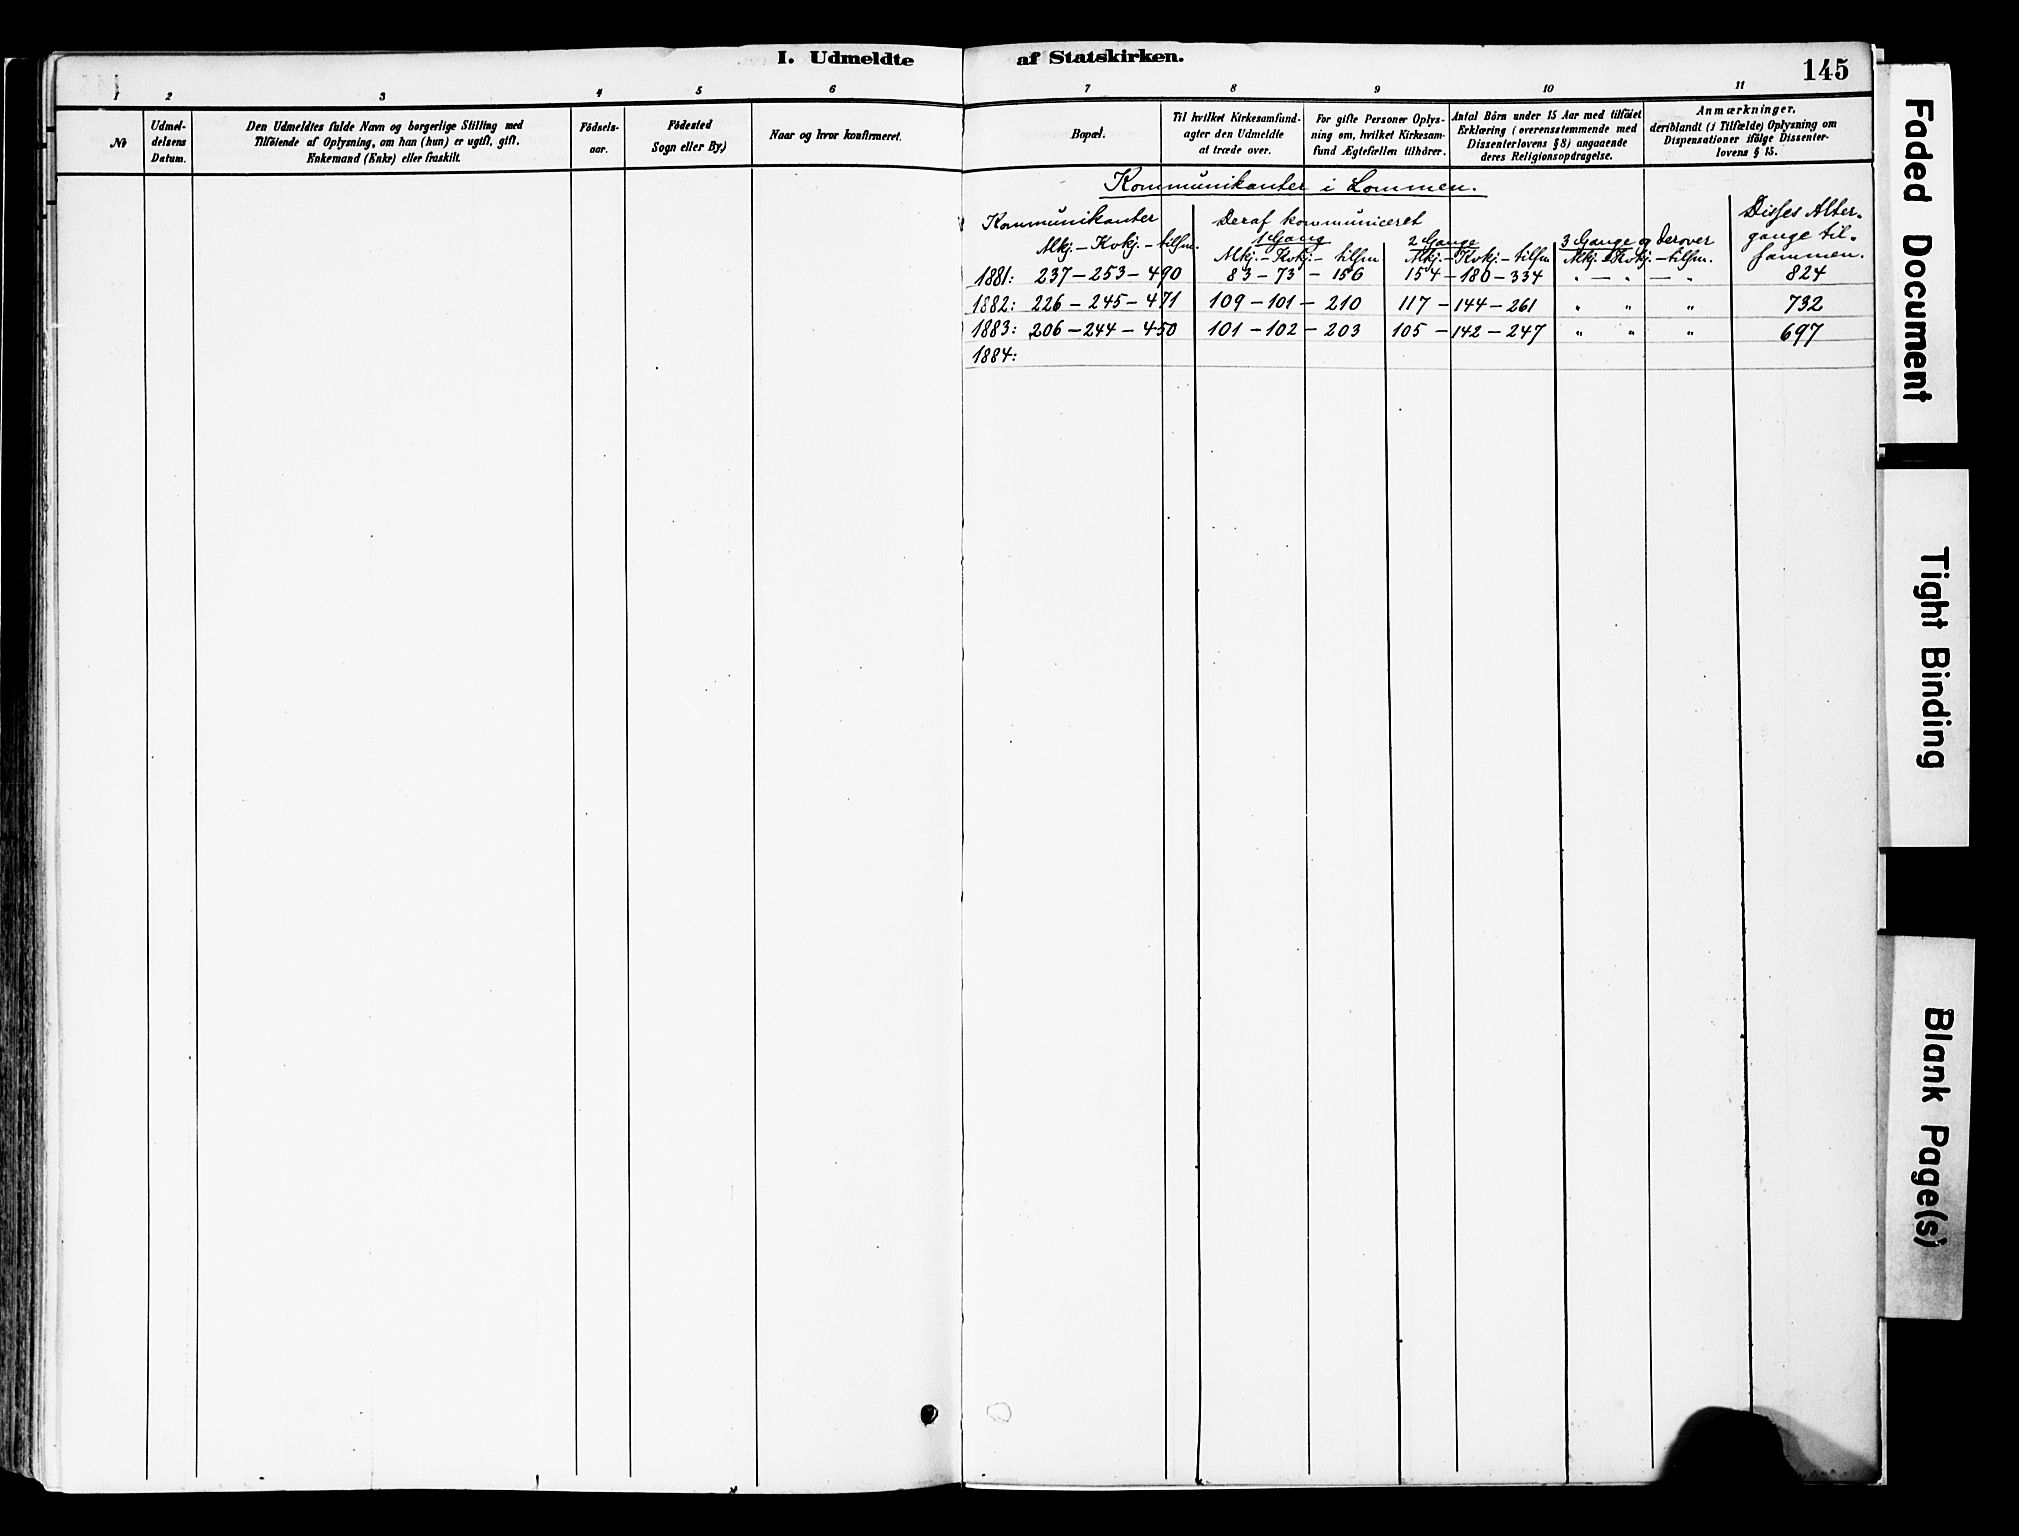 SAH, Vestre Slidre prestekontor, Ministerialbok nr. 5, 1881-1912, s. 145